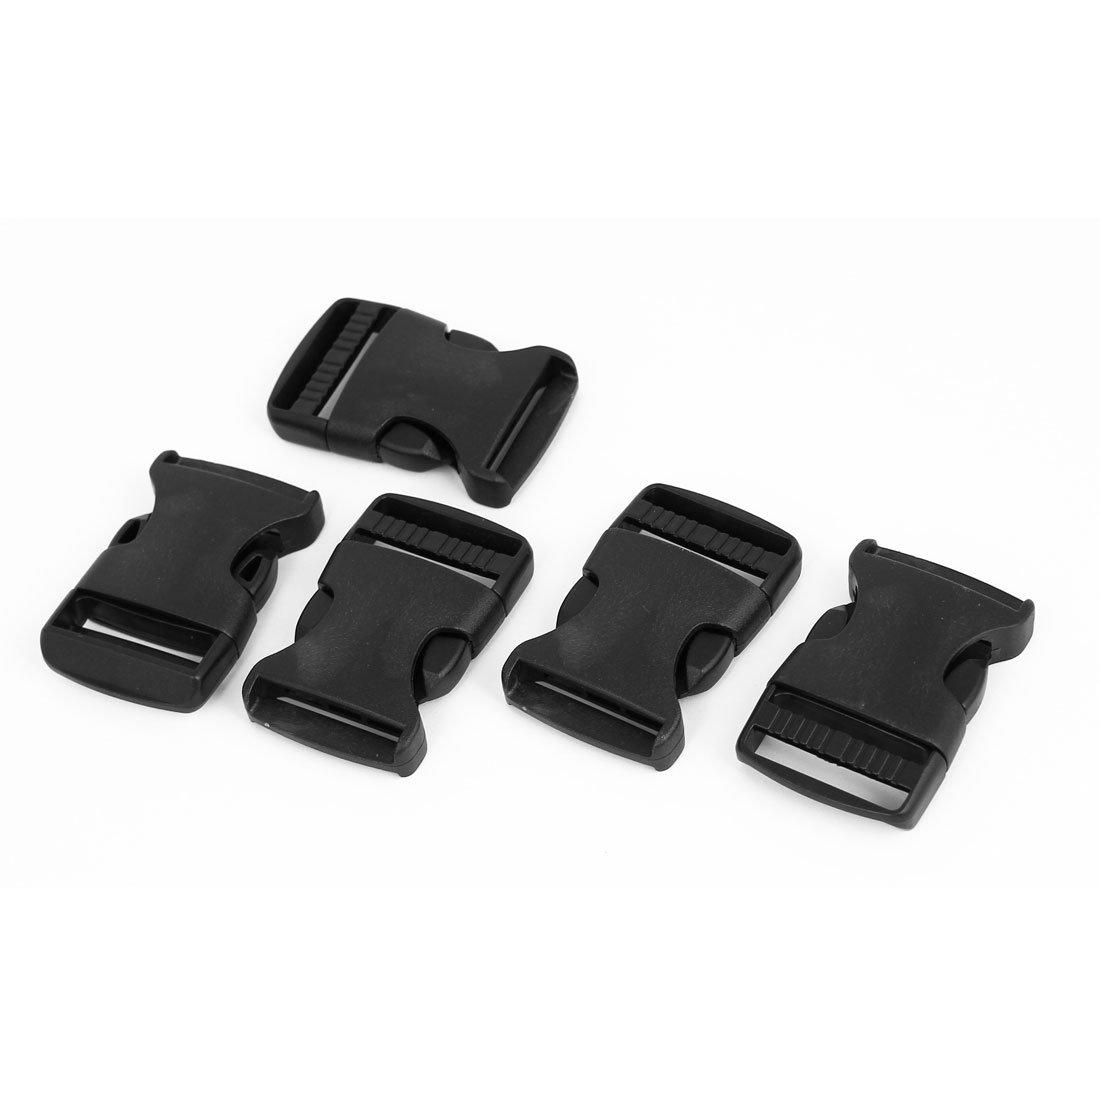 Plastic 1 1/4 Wide Webbing Strap Side Release Buckle 5Pcs Black uxcell a15081400ux0313